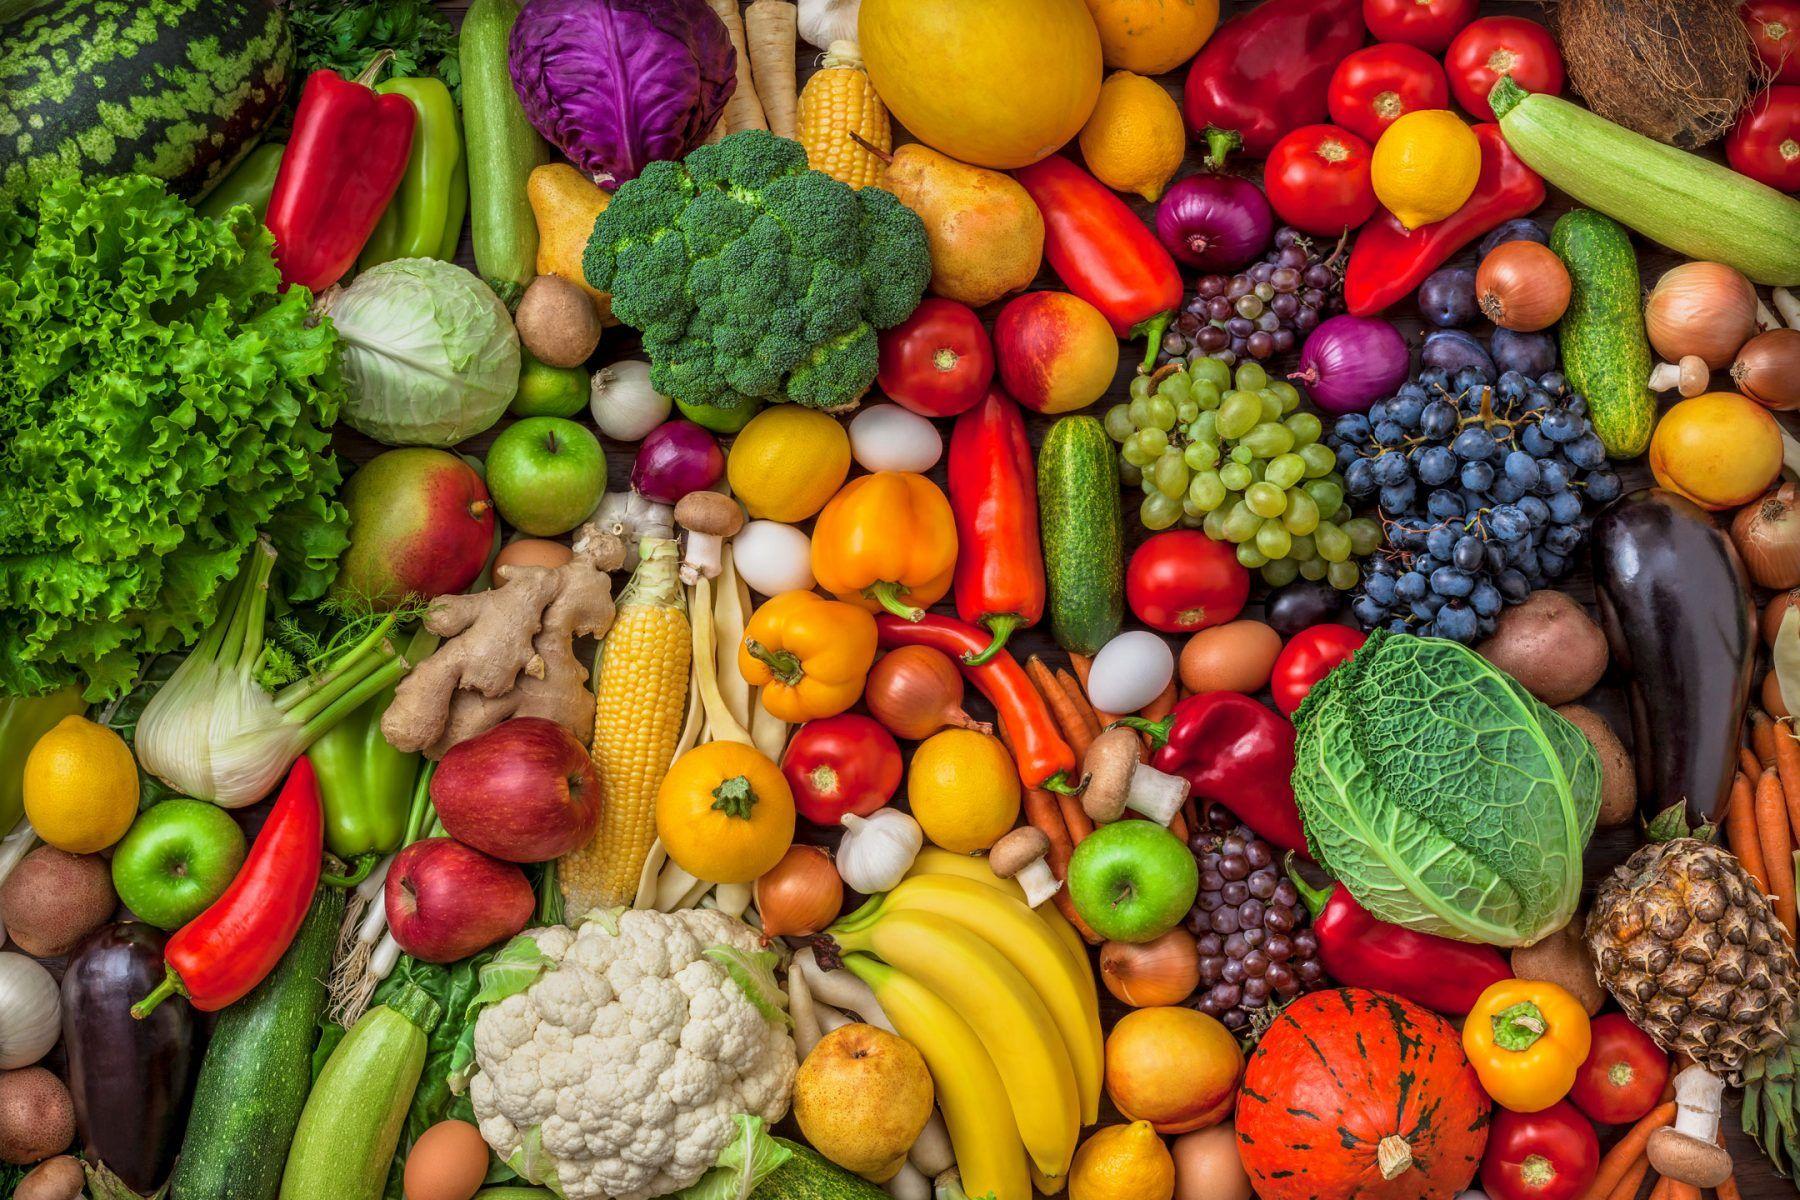 Dossier Fruits Et Legumes De Saison Au Mois D Octobre Rezepte Gesund Fruhstucksideen Gesund Clean Eating